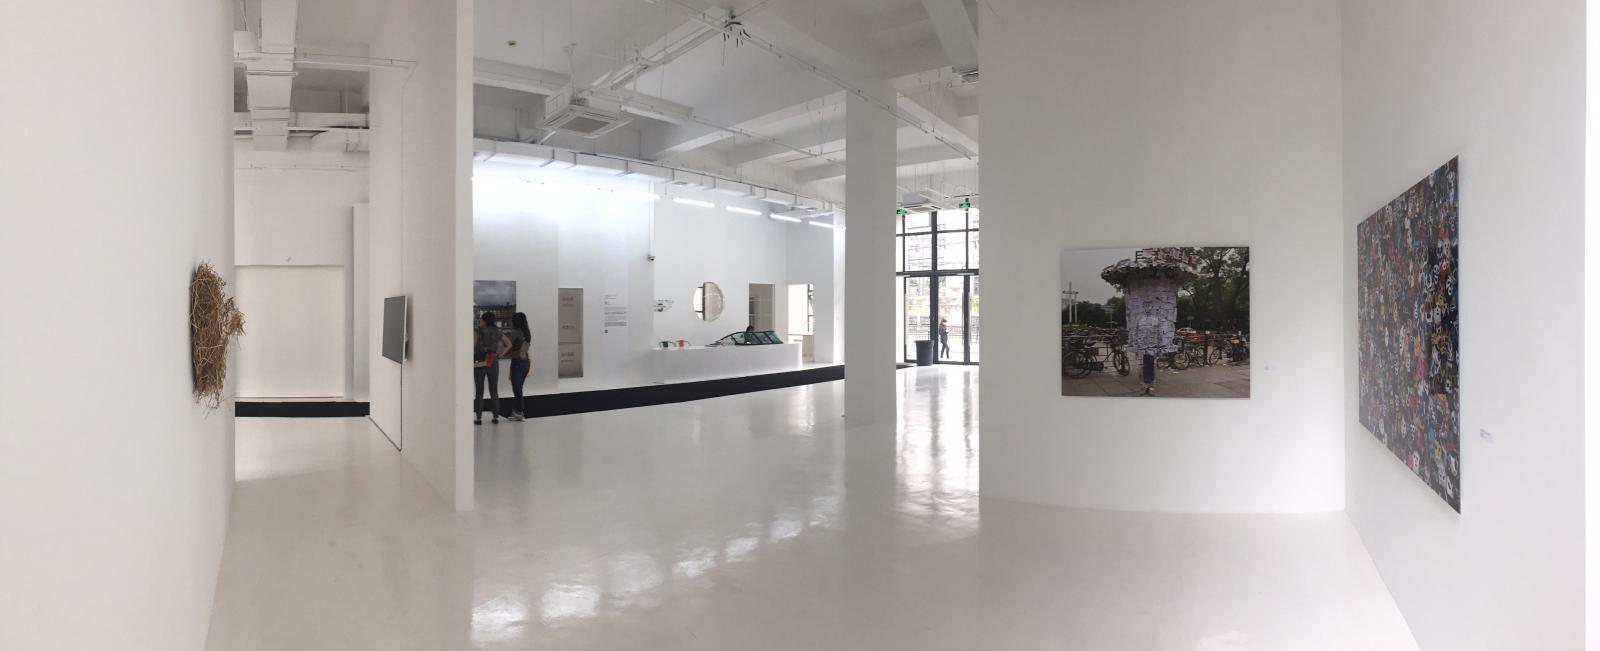 La MD Gallery, fondée par Magda Danysz. photo c. boudehen